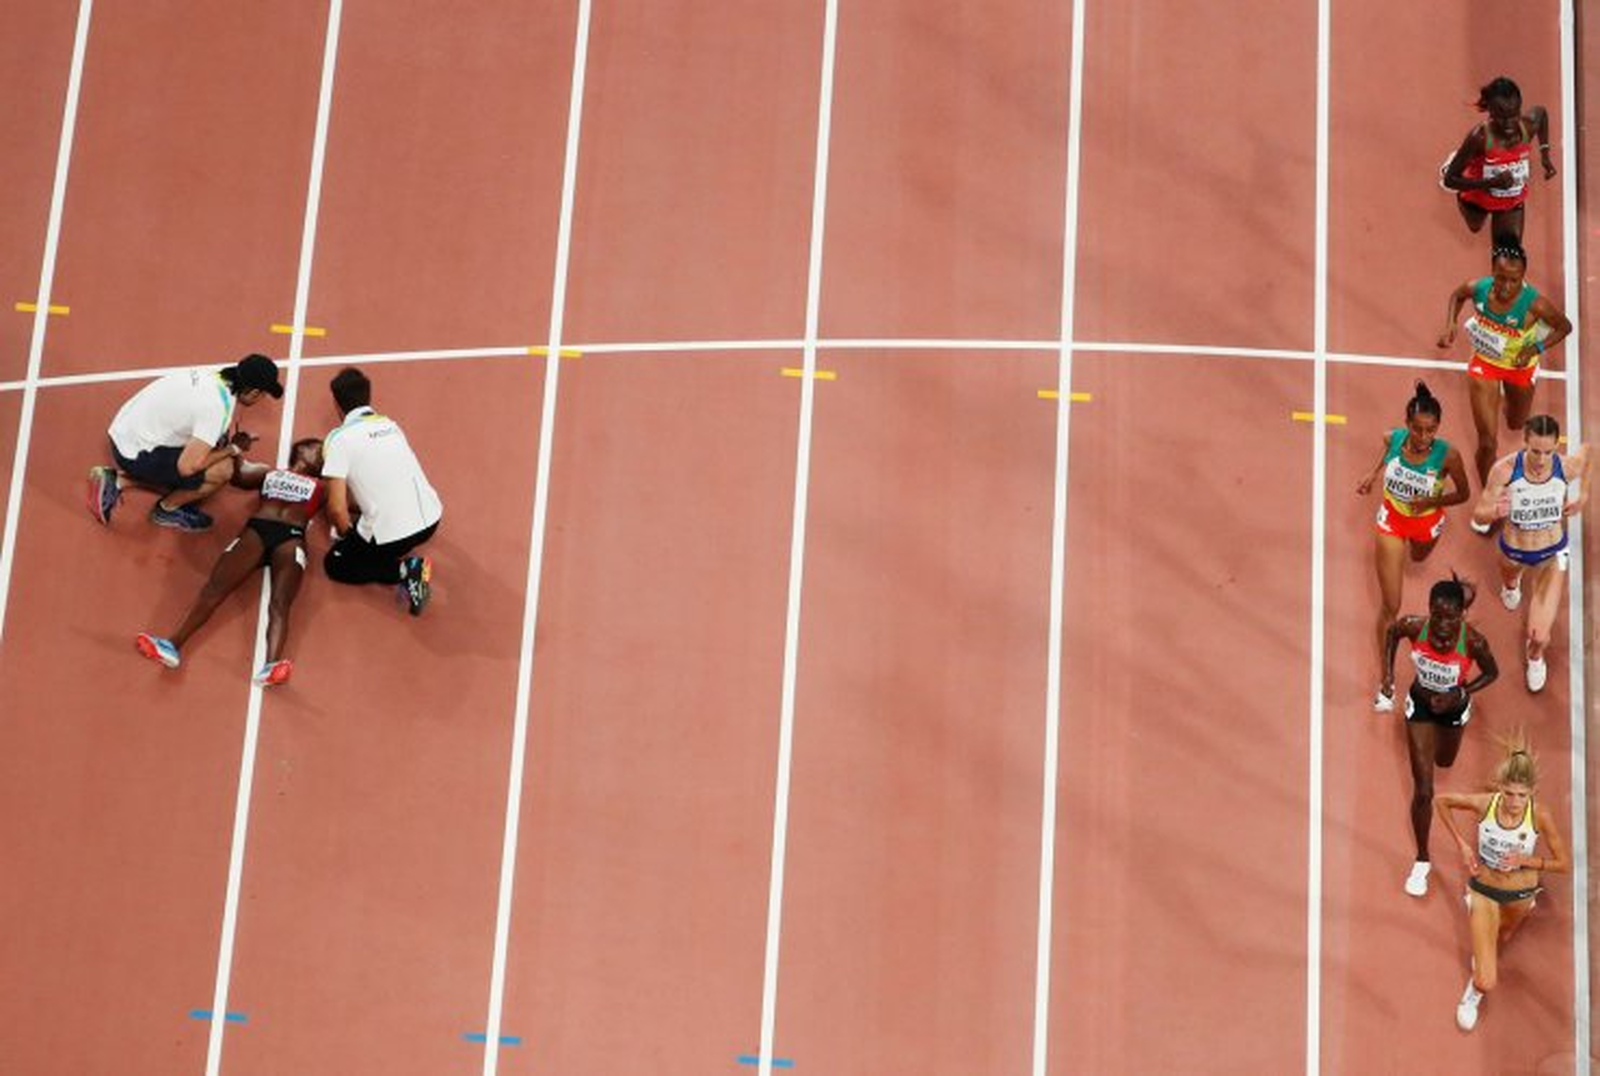 Athletics - World Athletics Championships - Doha 2019 - Women's 5000 Metres Heats - Khalifa International Stadium, Doha, Qatar - October 2, 2019  Bahrain's Tigist Gashaw receives medical attention while athletes compete  REUTERS